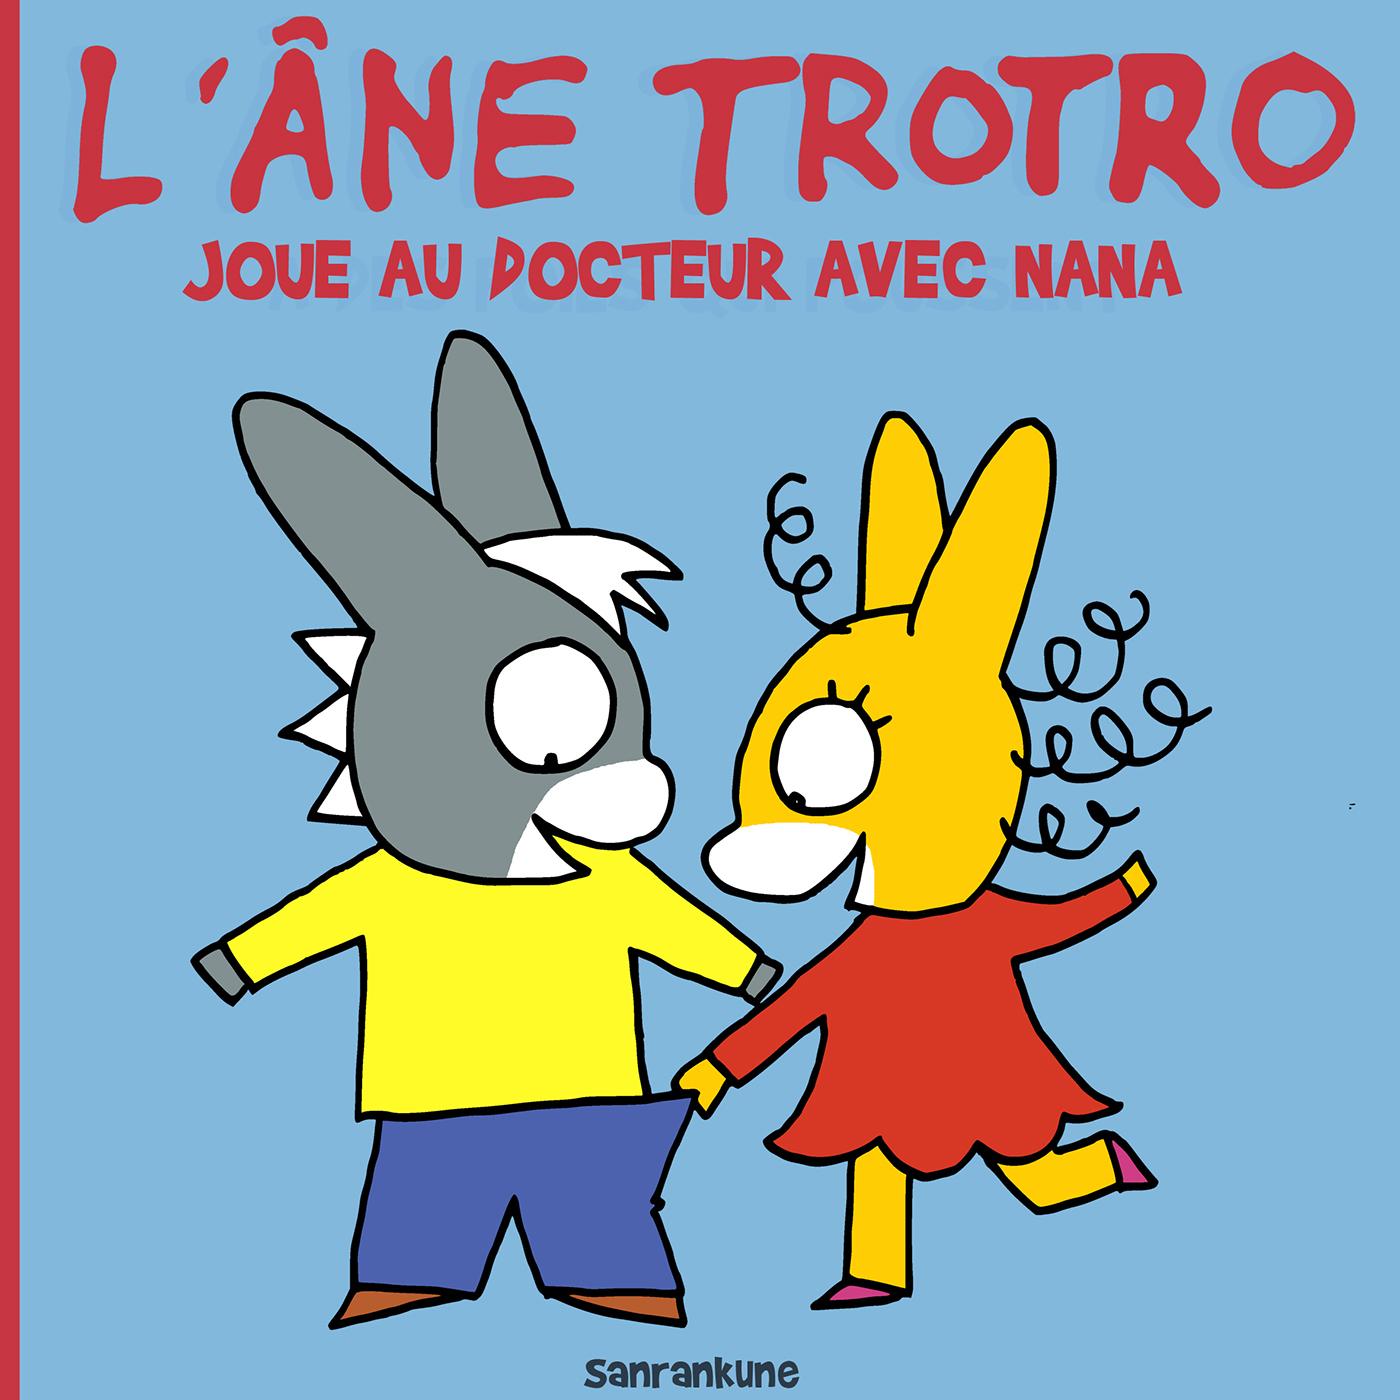 Lane Tro Tro. Trotro En Franais. Lne Trotro Et Zaza Ftent à Nouveau Trotro